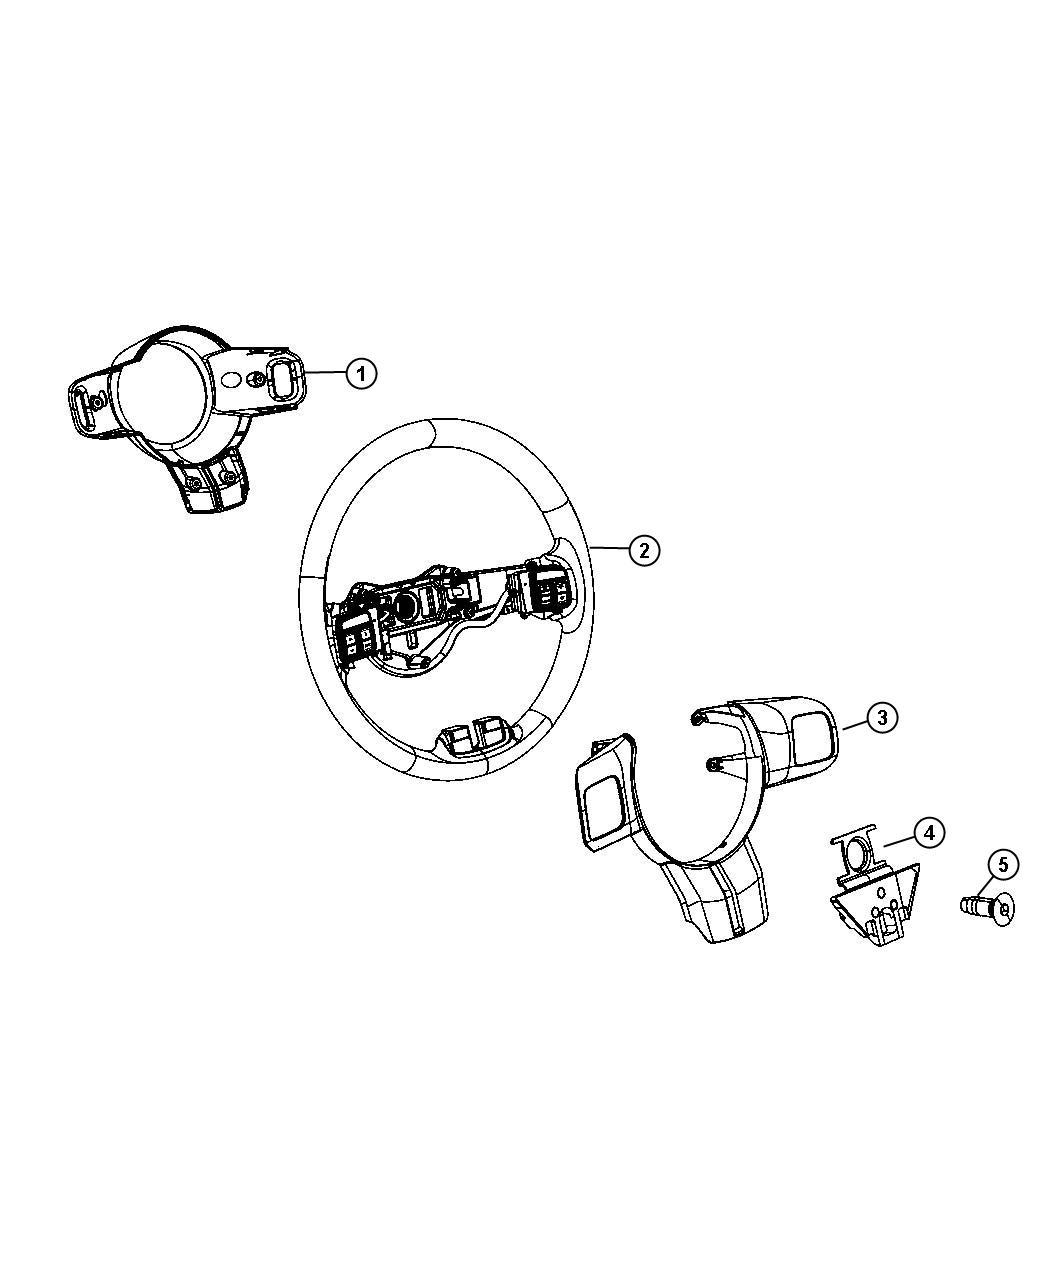 Jeep Grand Cherokee Wheel Steering Export Trim All Trim Codes Color Black